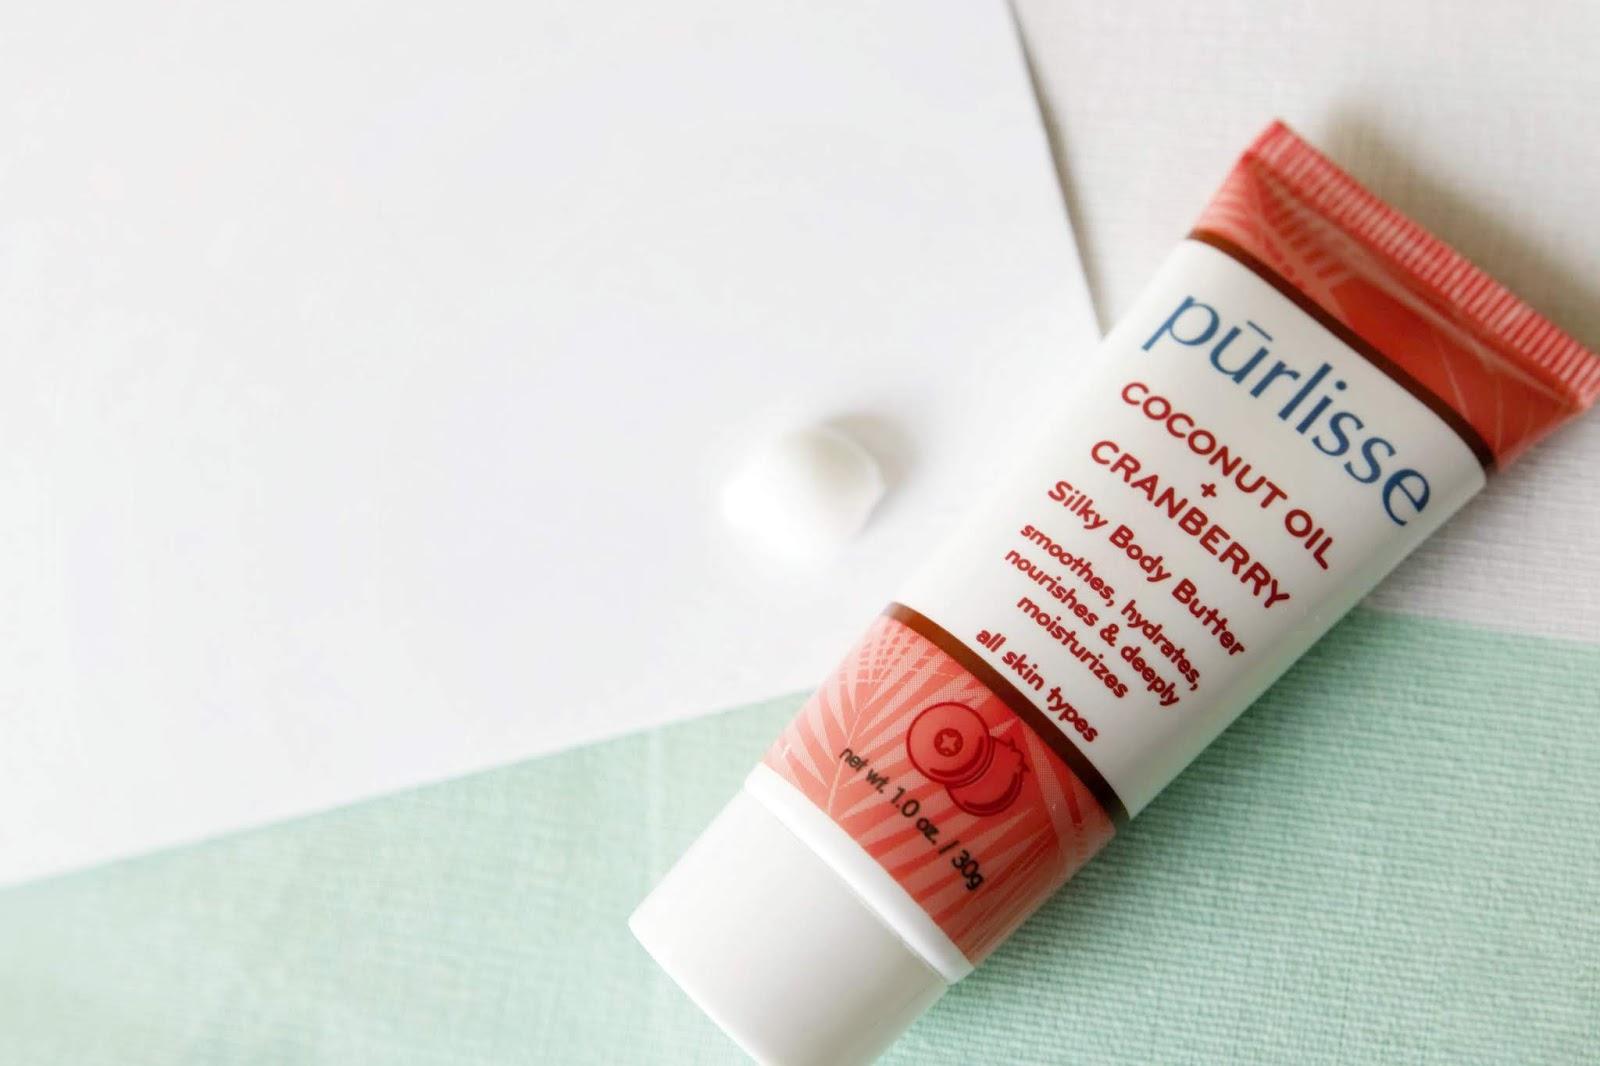 purlisse body butter coconut oil cranberry skincare makeup beauty guru